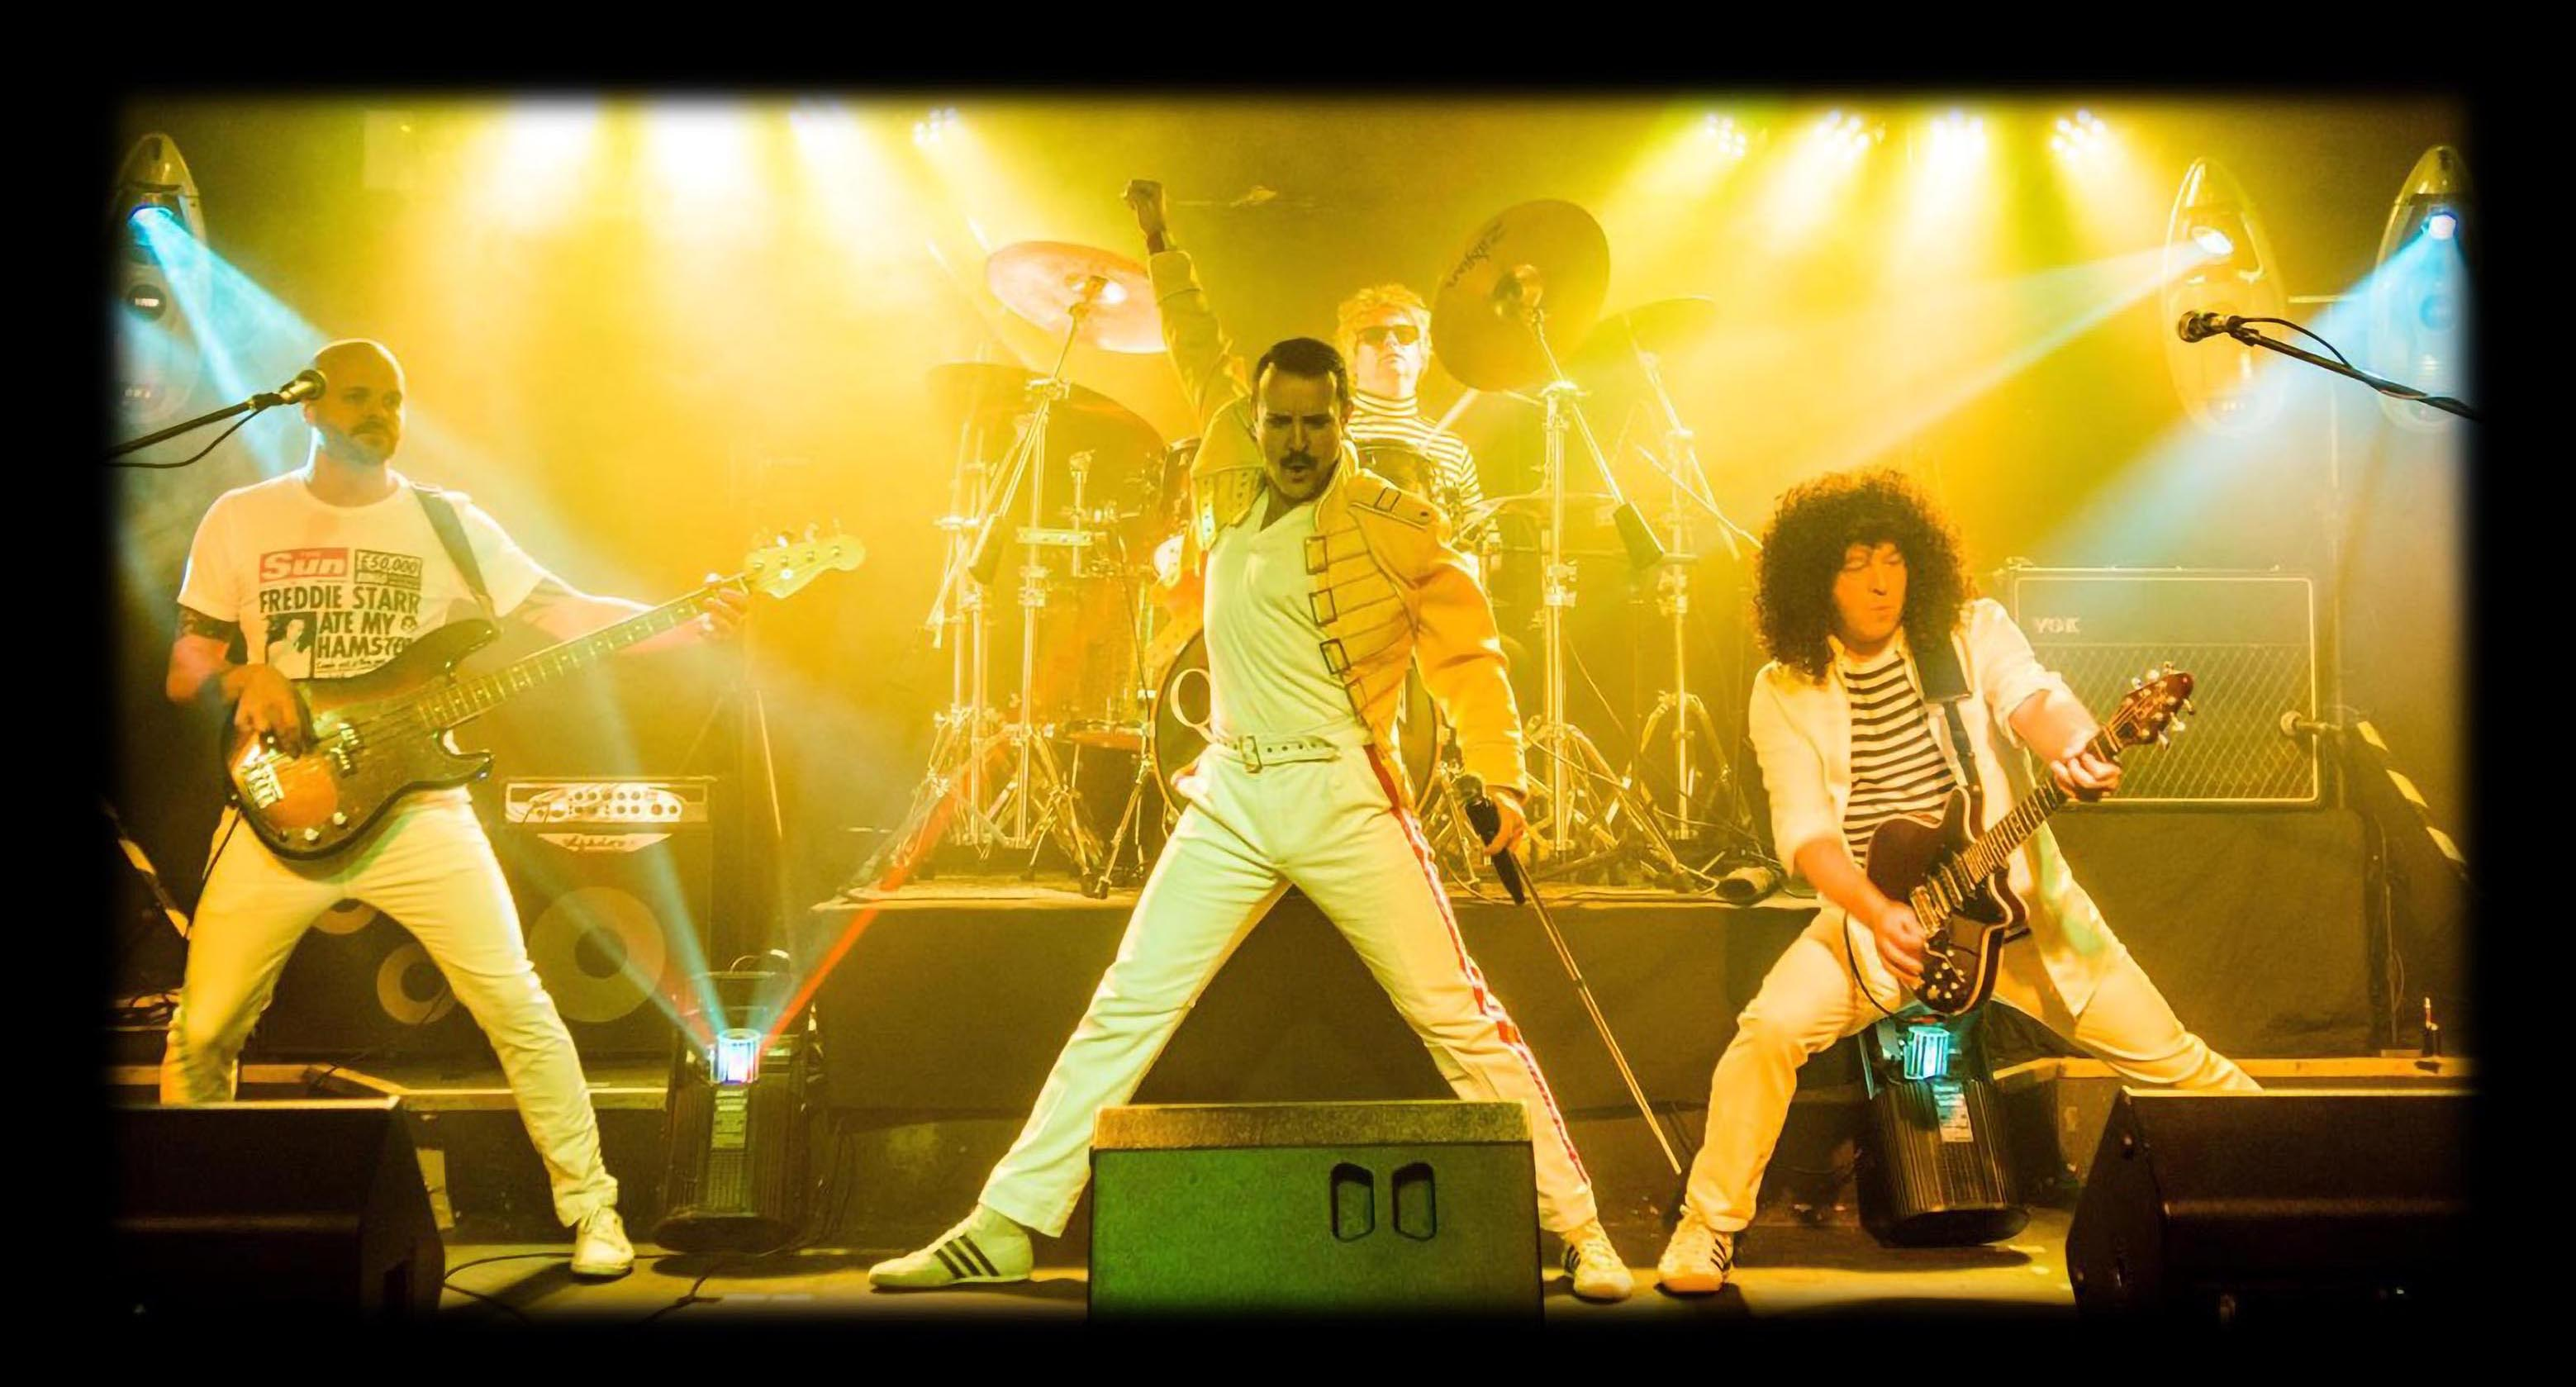 Freddie Mercury Tribute Night Darlaston banner image